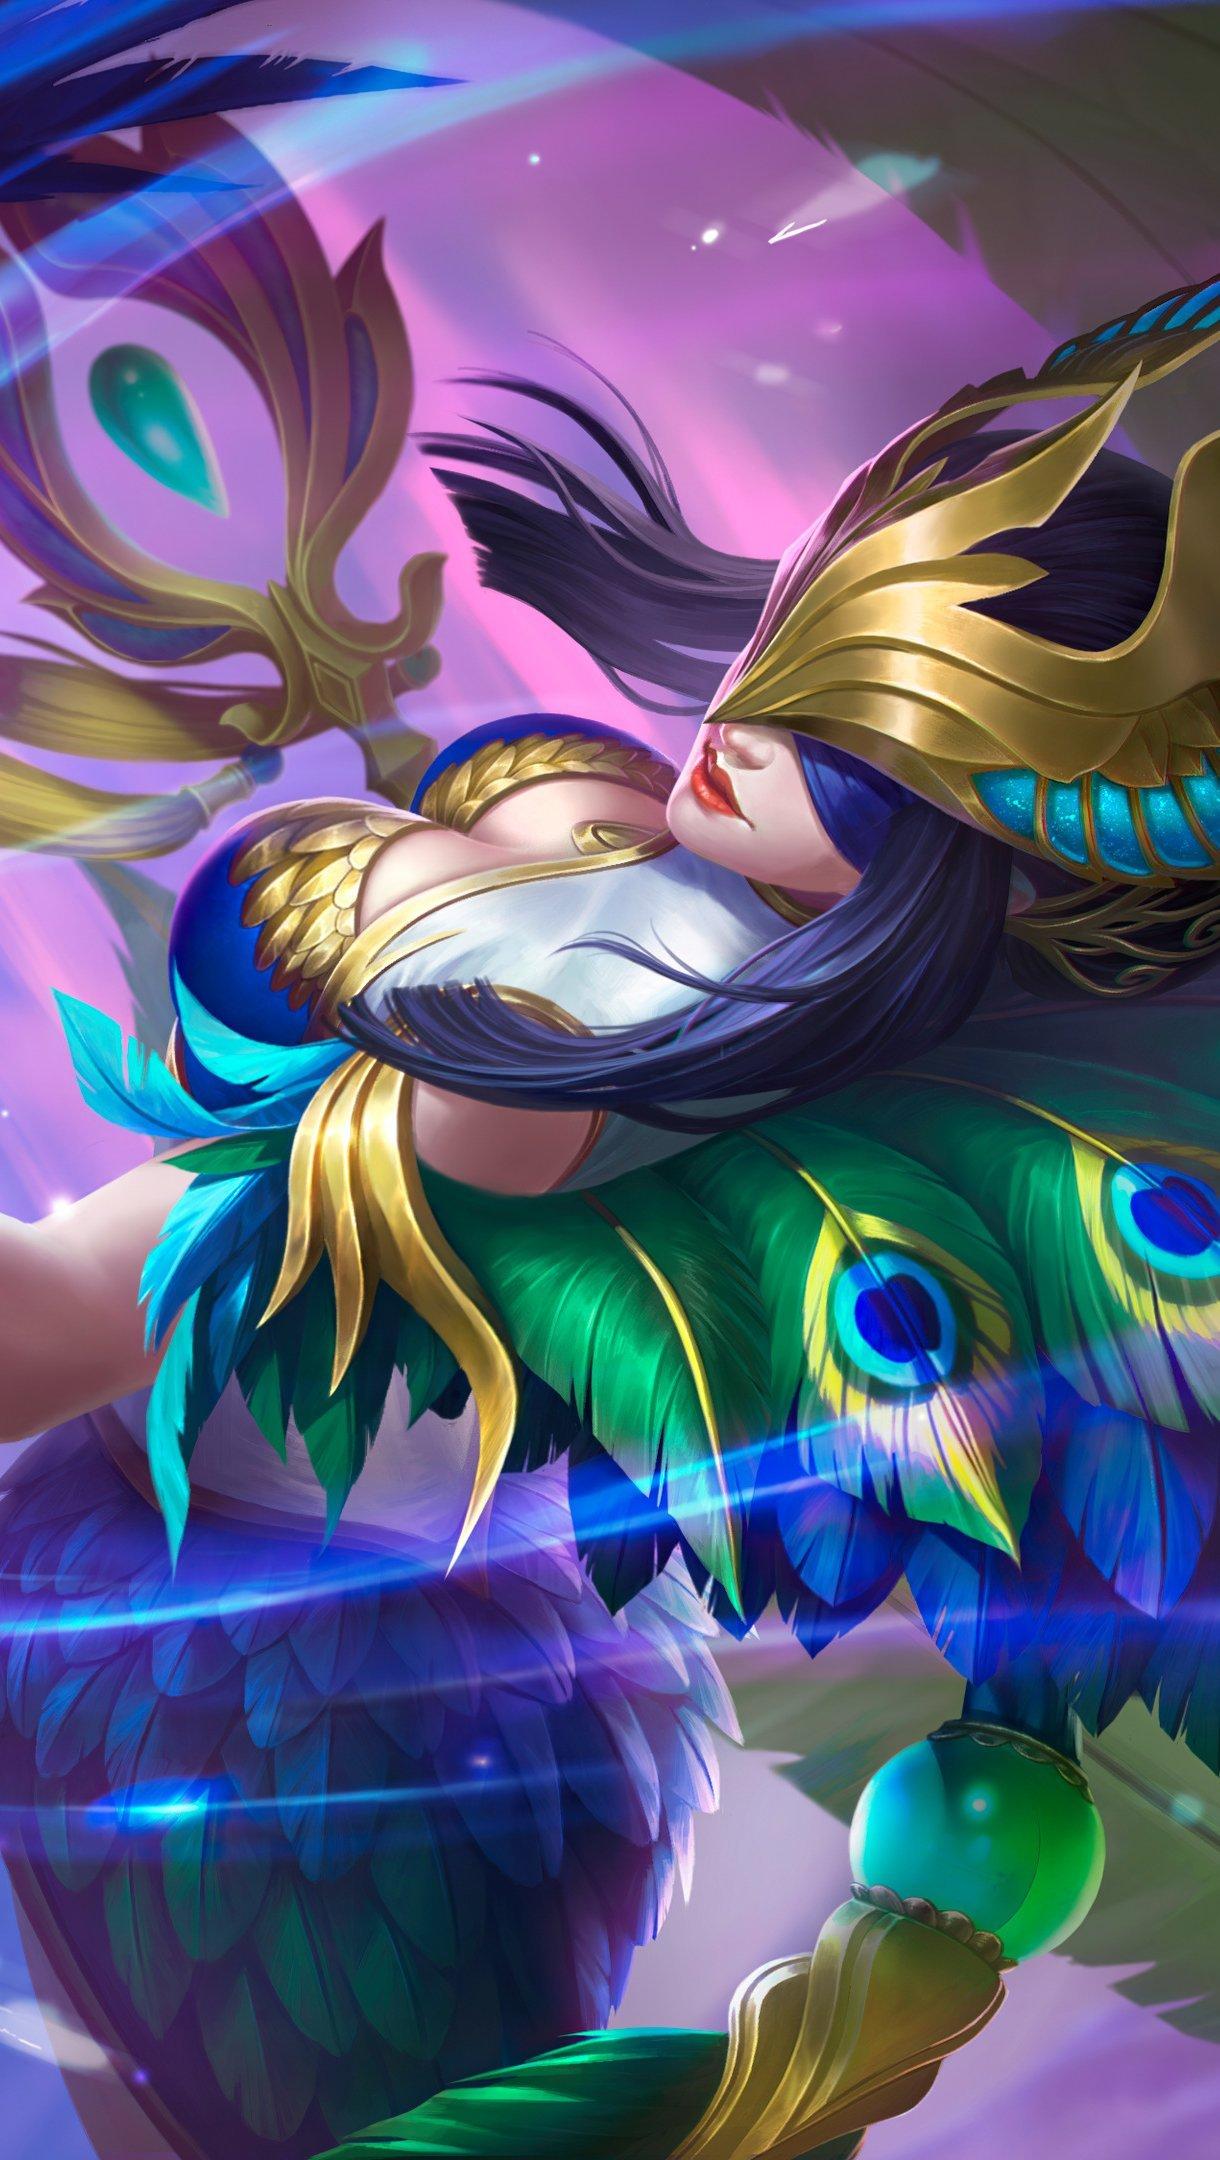 Fondos de pantalla Pharsa Skin de League of Legends Vertical